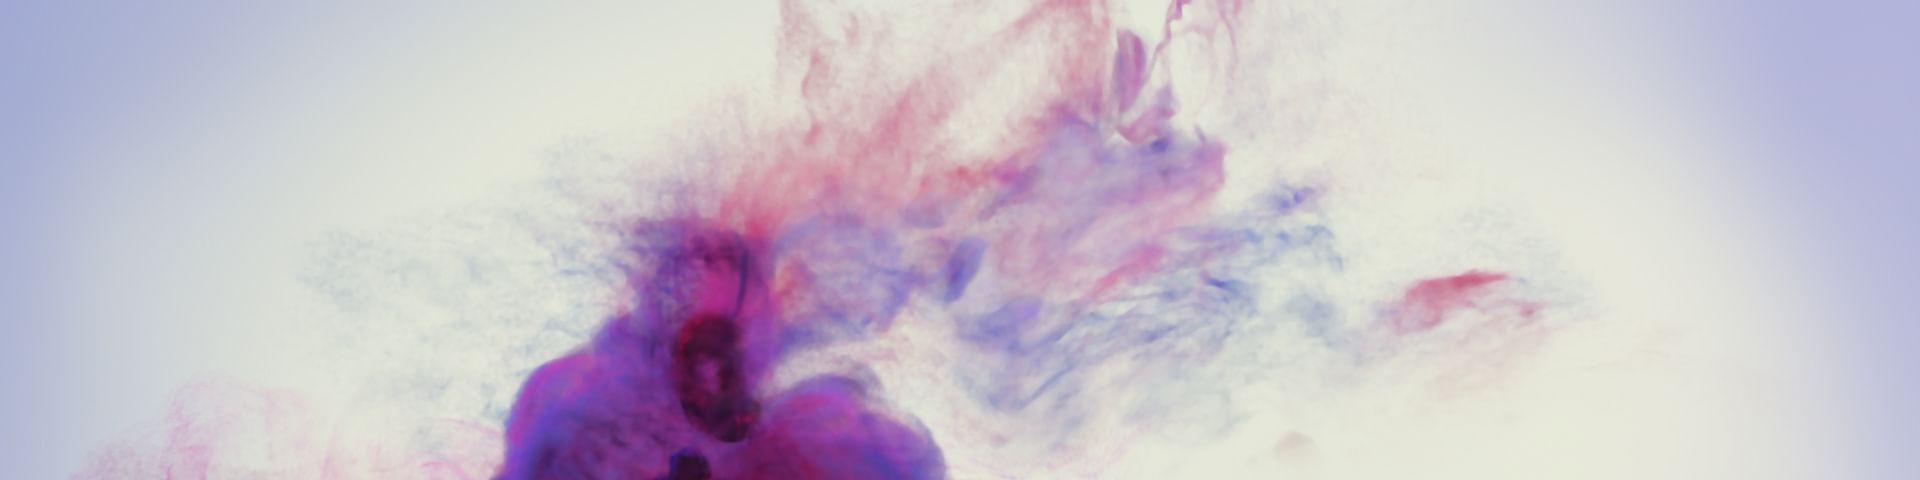 Depeche Mode / UK Rapper Loyle Carner / Thomas Mailaender